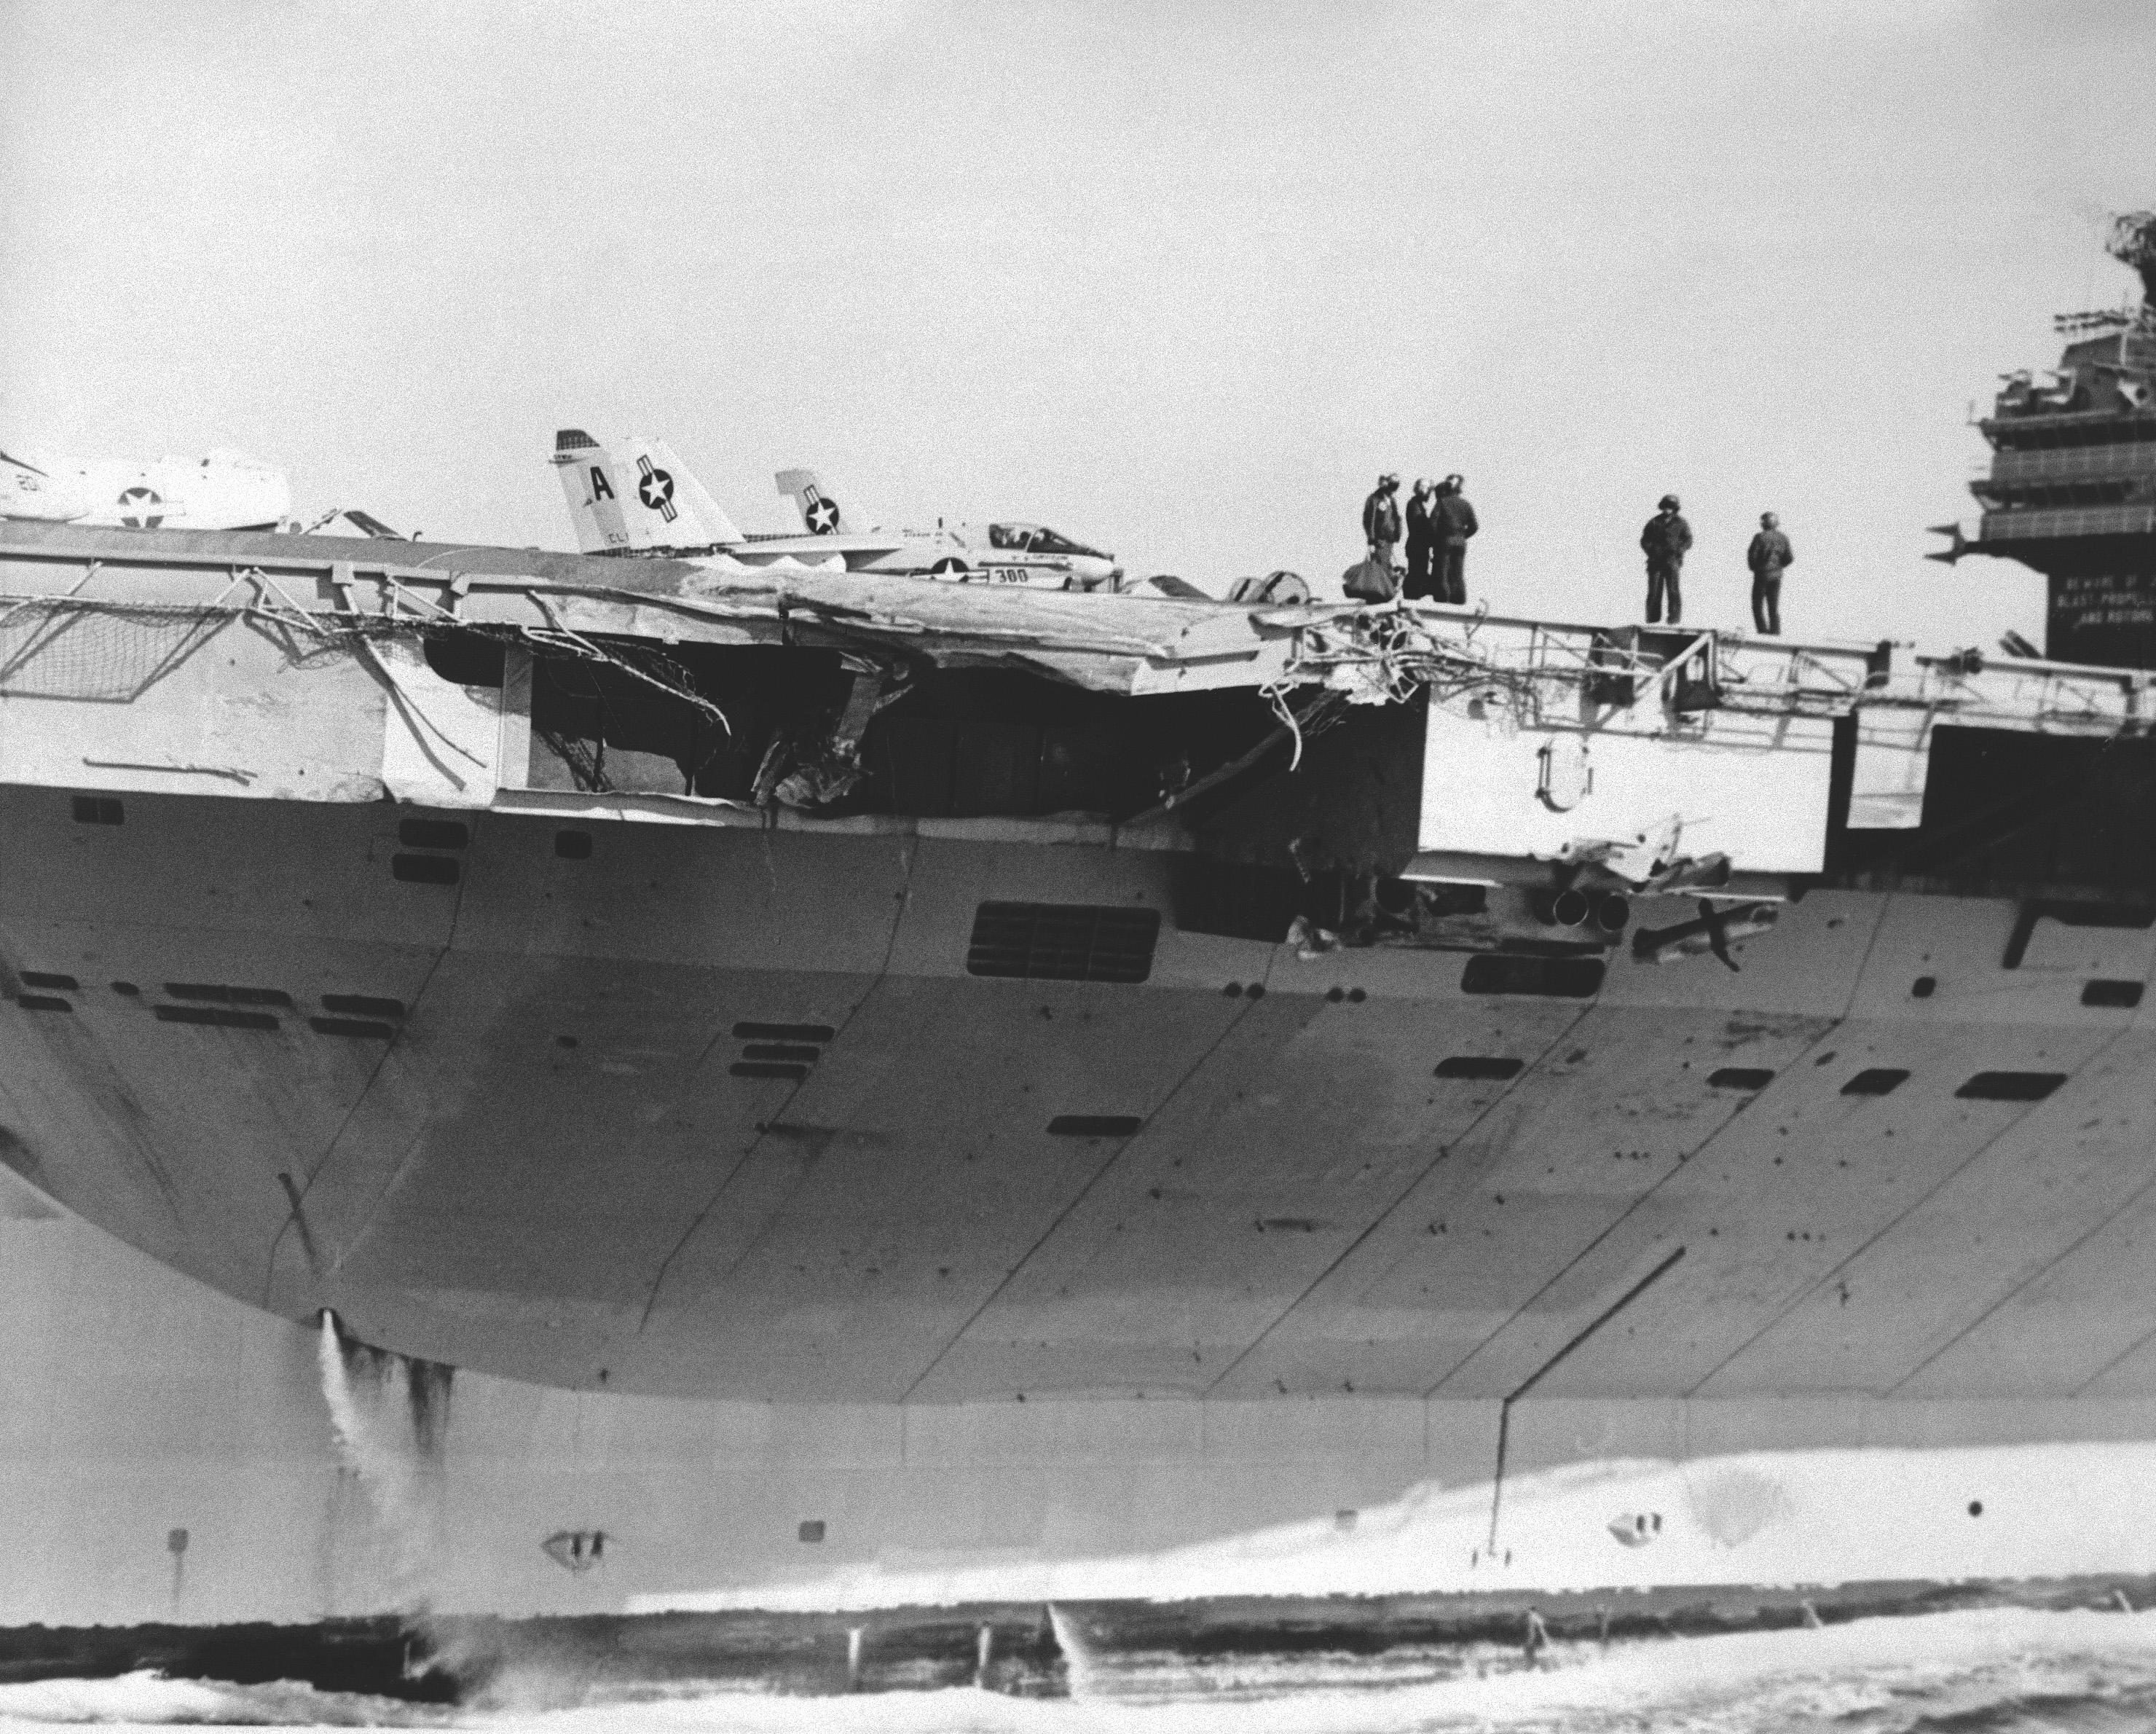 USS_John_F._Kennedy_(CV-67),_collision_damage,_1975.jpg